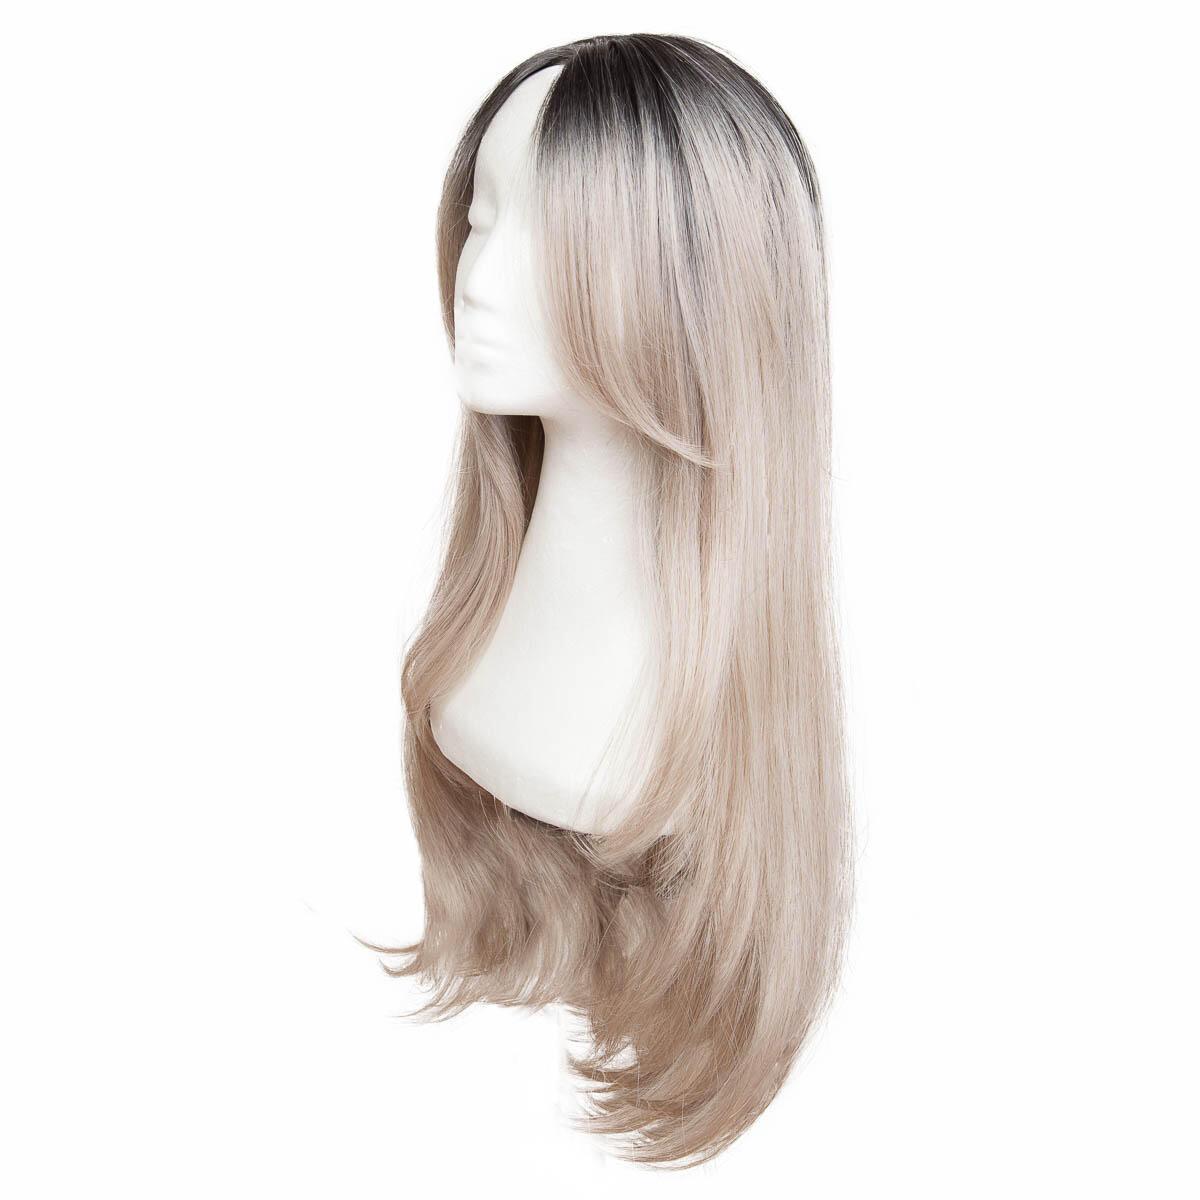 Lace Front Wig O1.2/10.5 Black Brown/Grey 60 cm